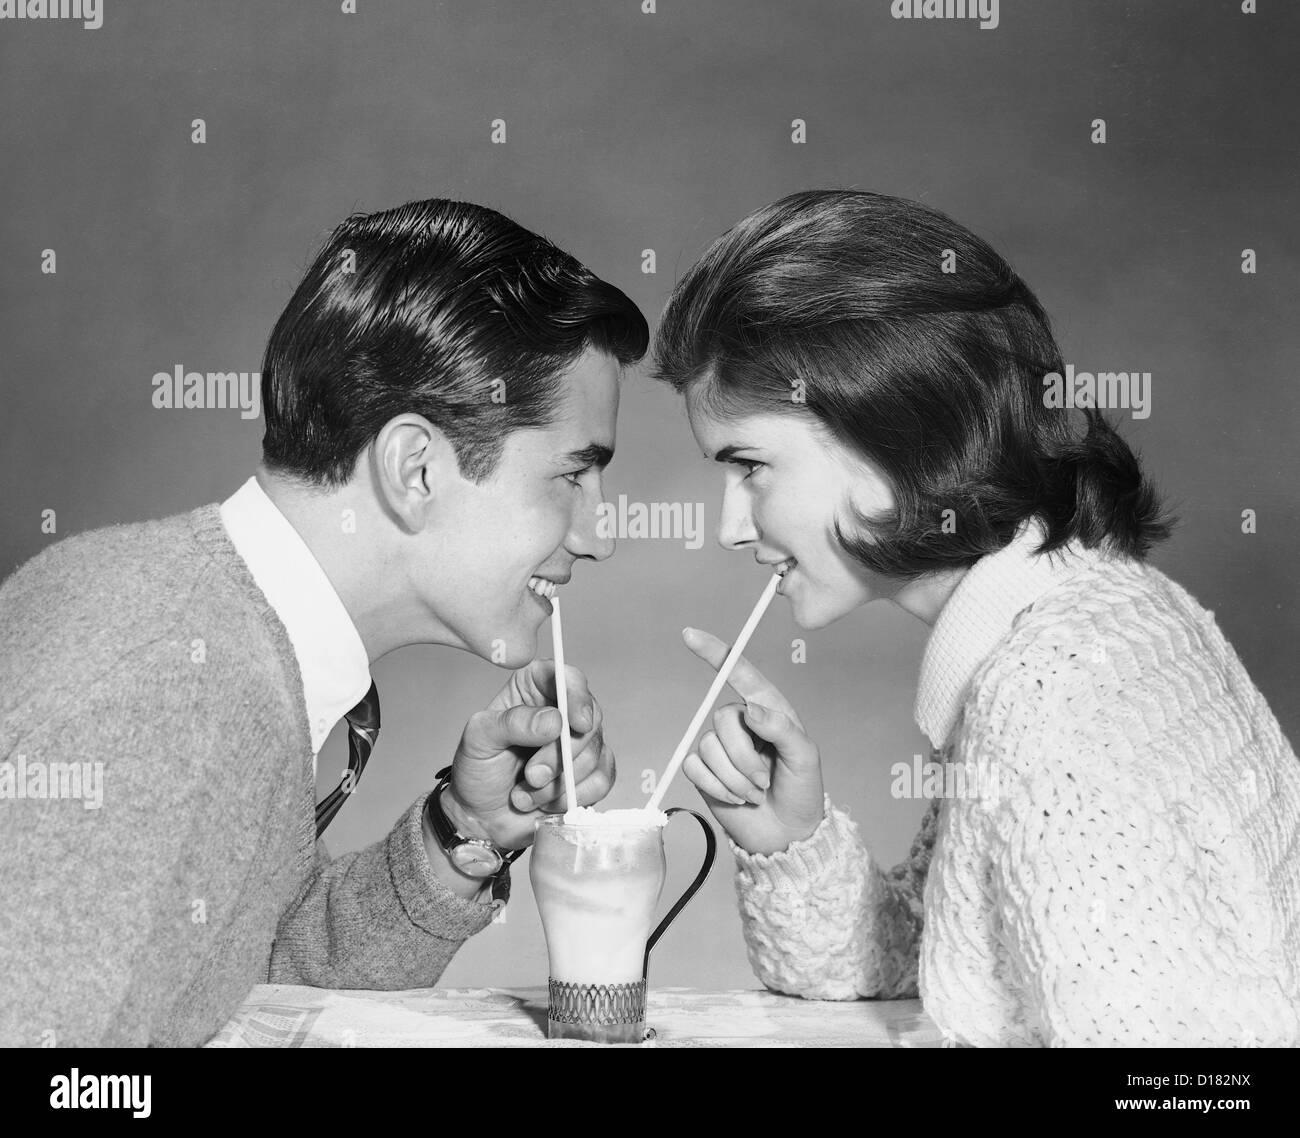 Historic shot of couple sharing ice cream soda at malt shop - Stock Image